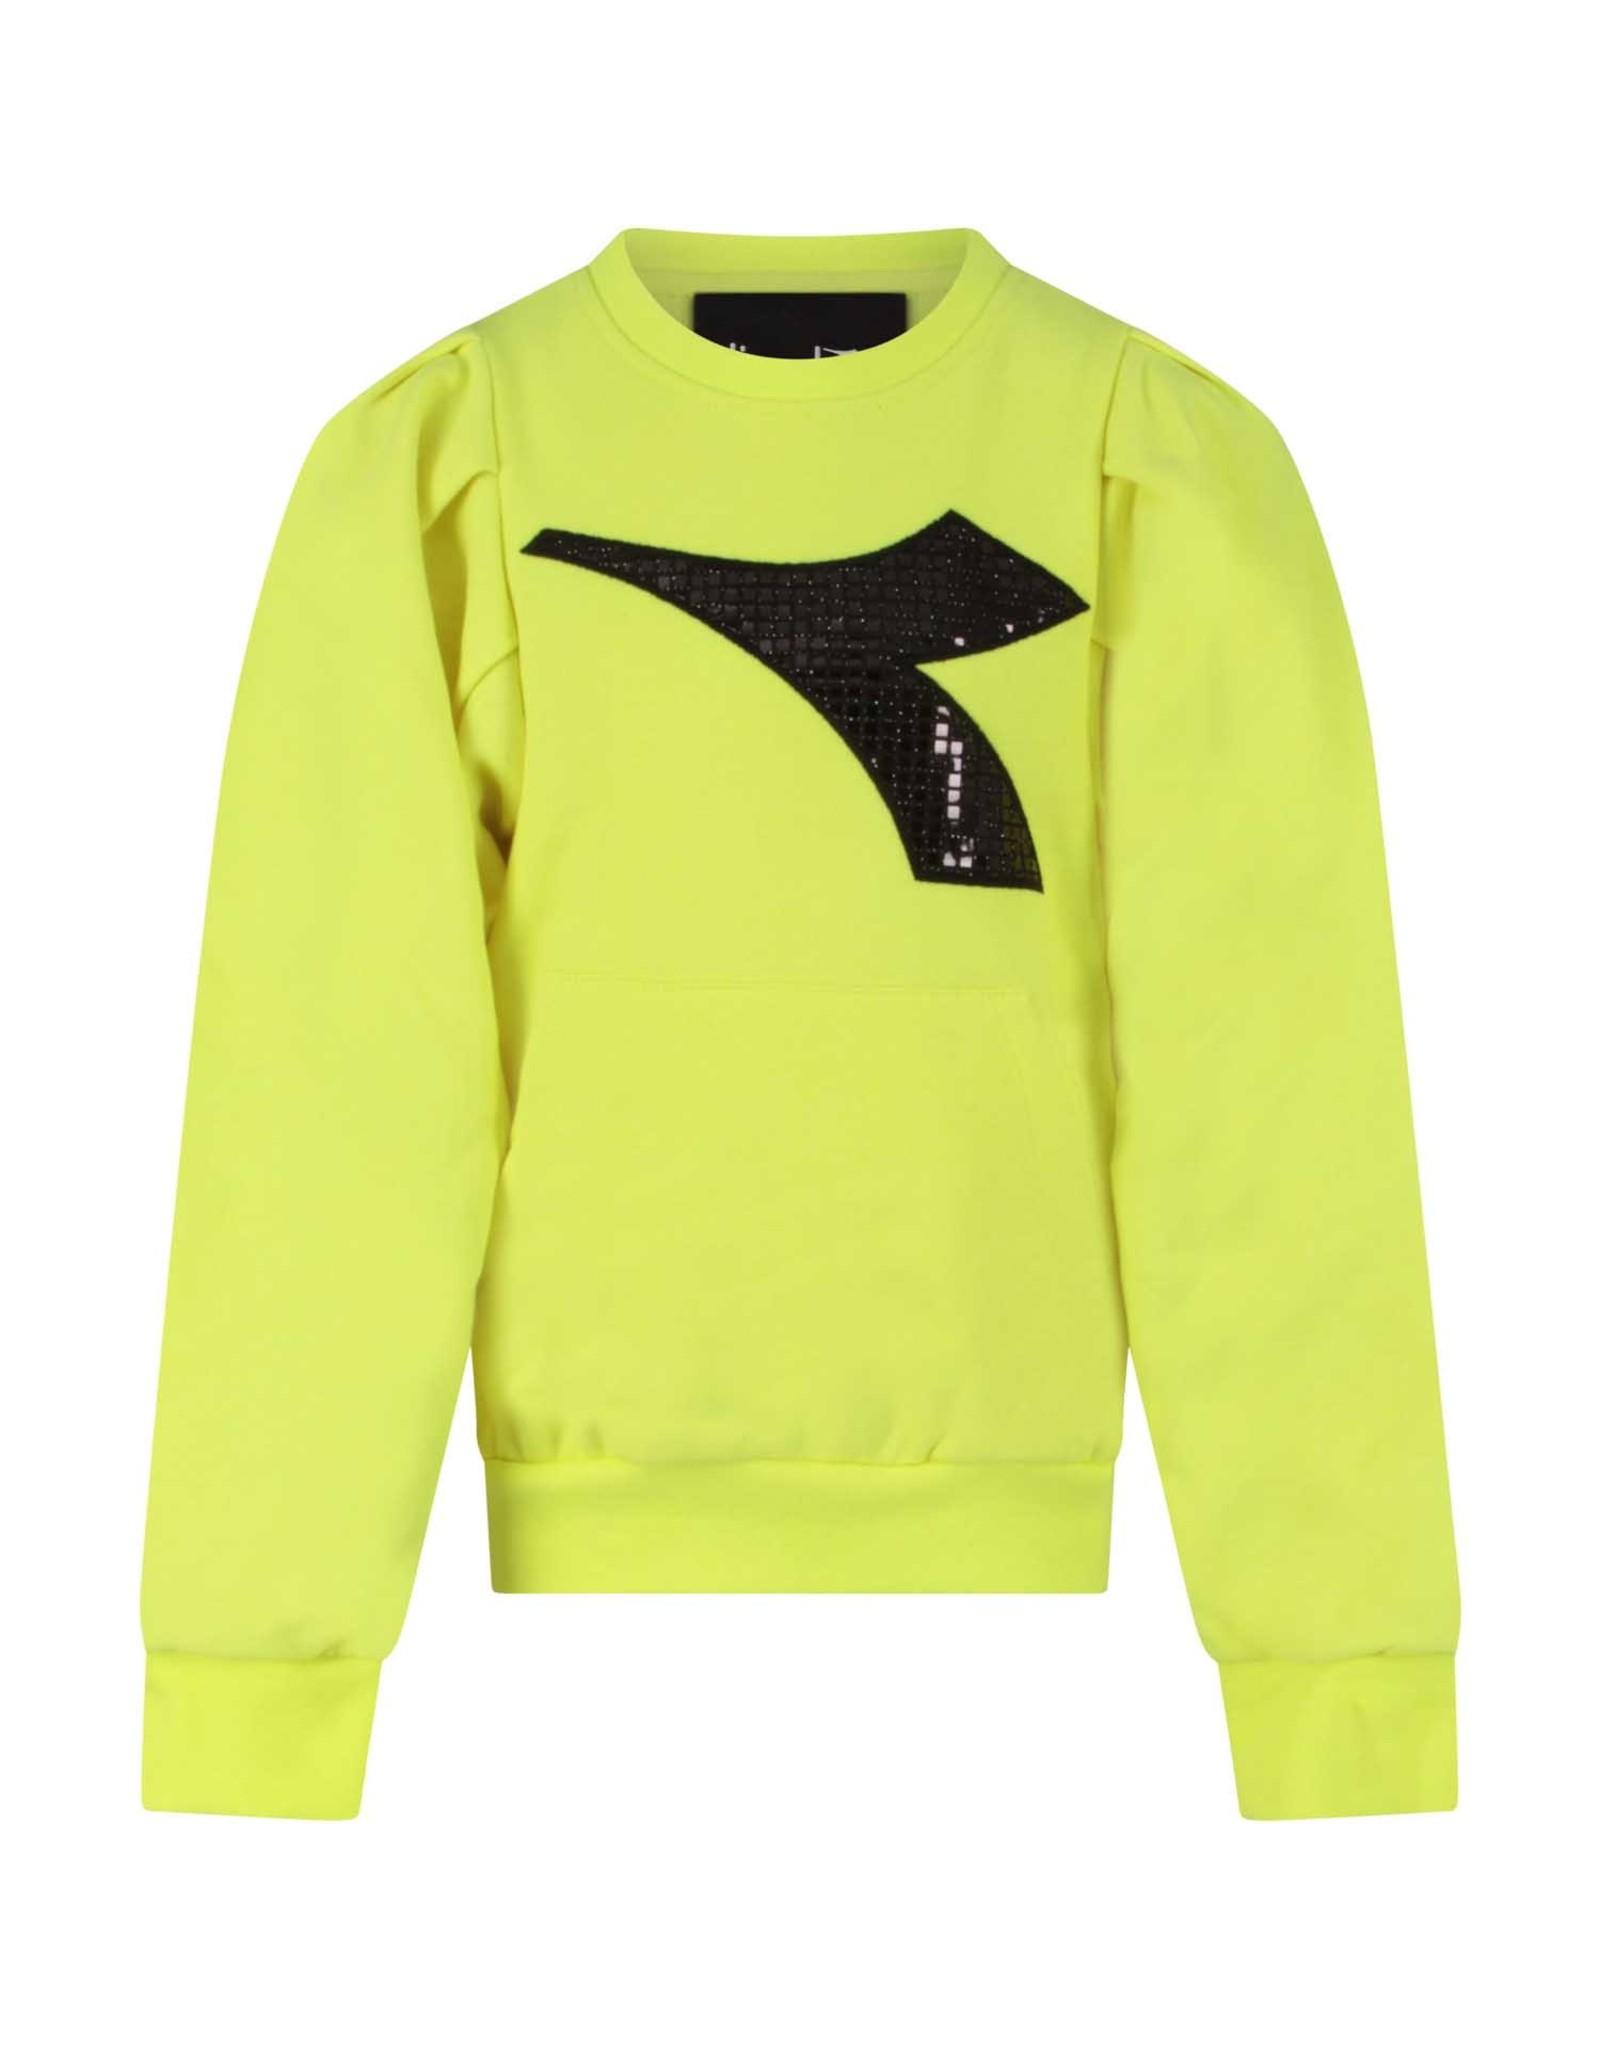 Diadora FW20 26298 sweatshirt fluo yellow